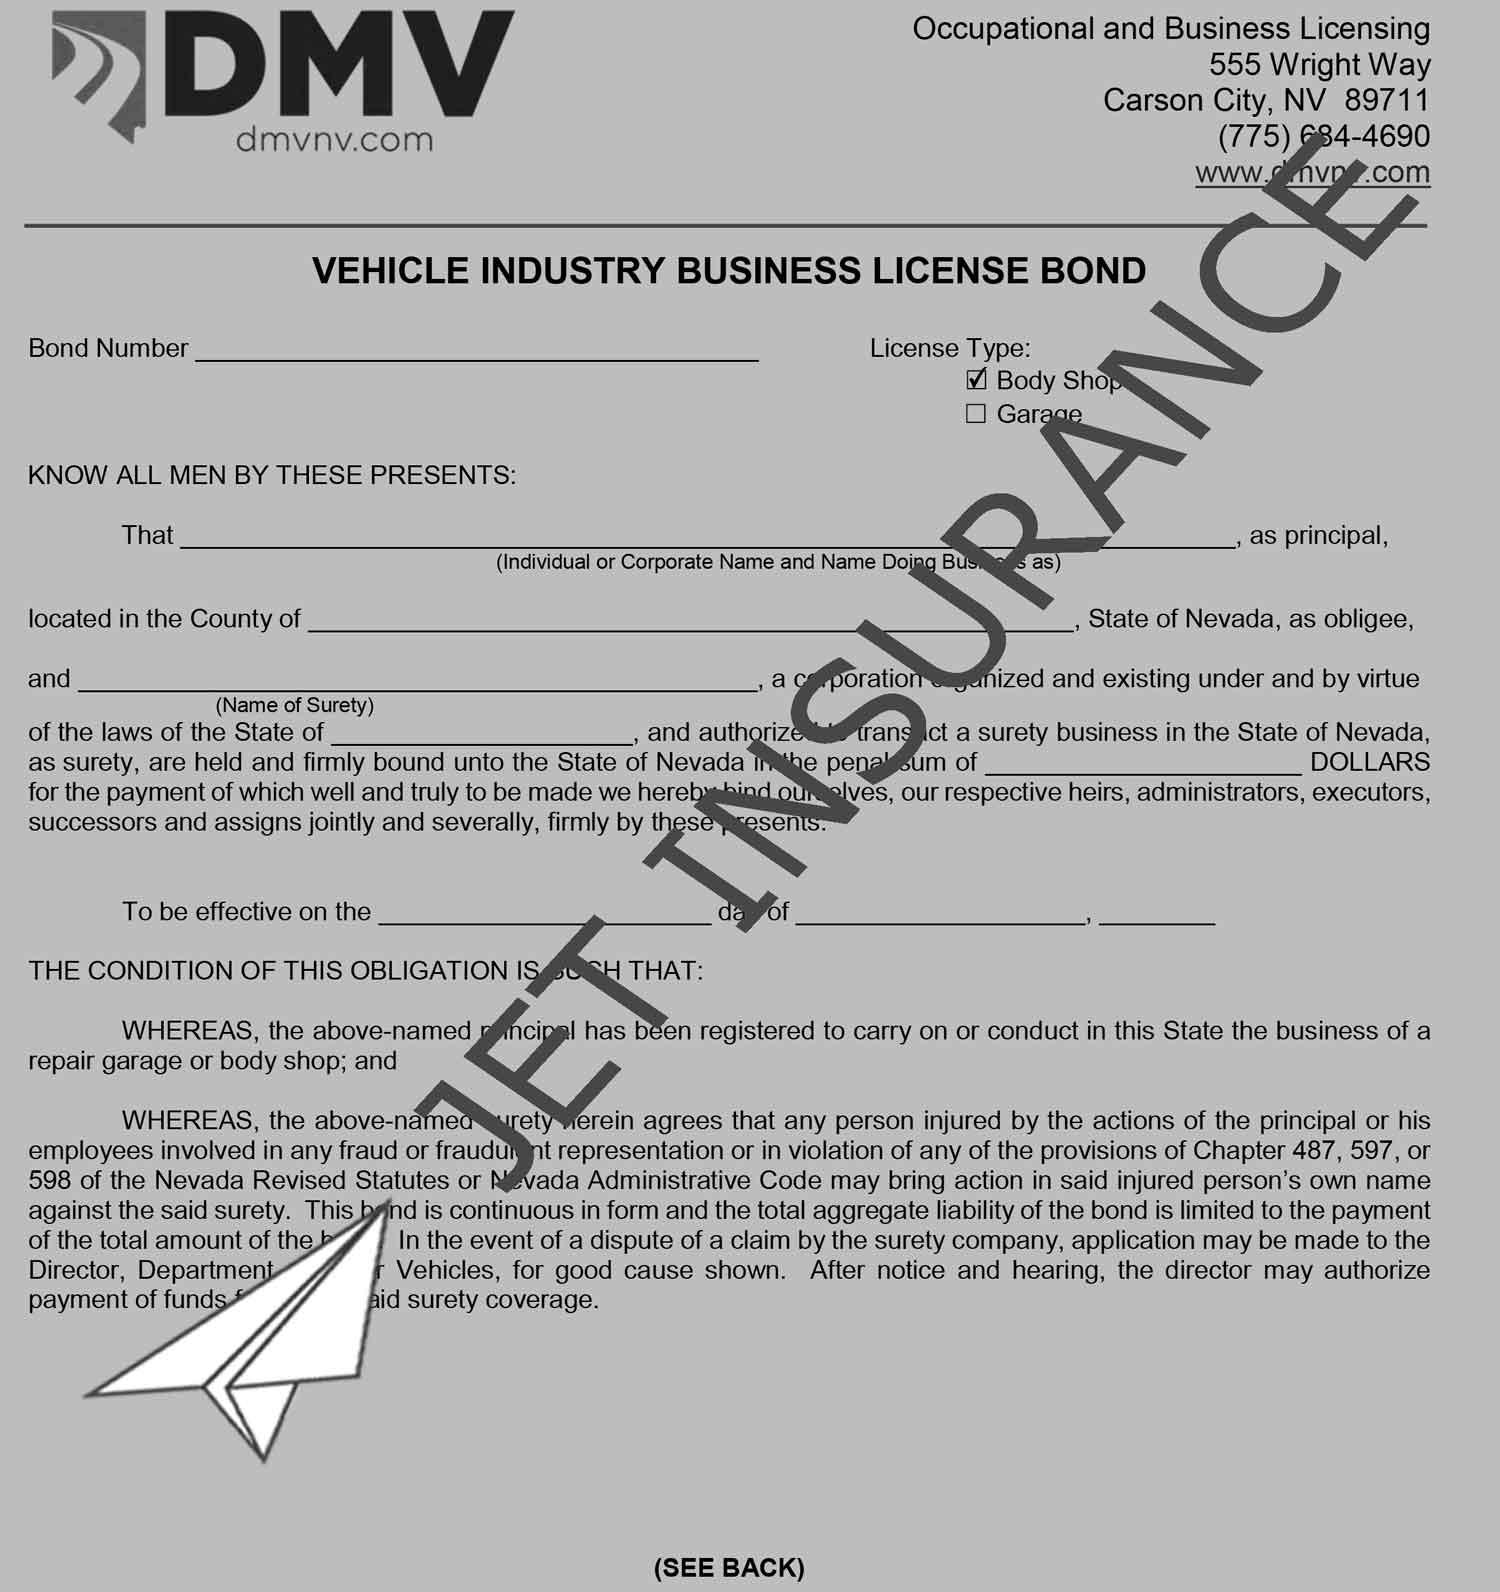 Nevada Body Shop and Garage Bond Form